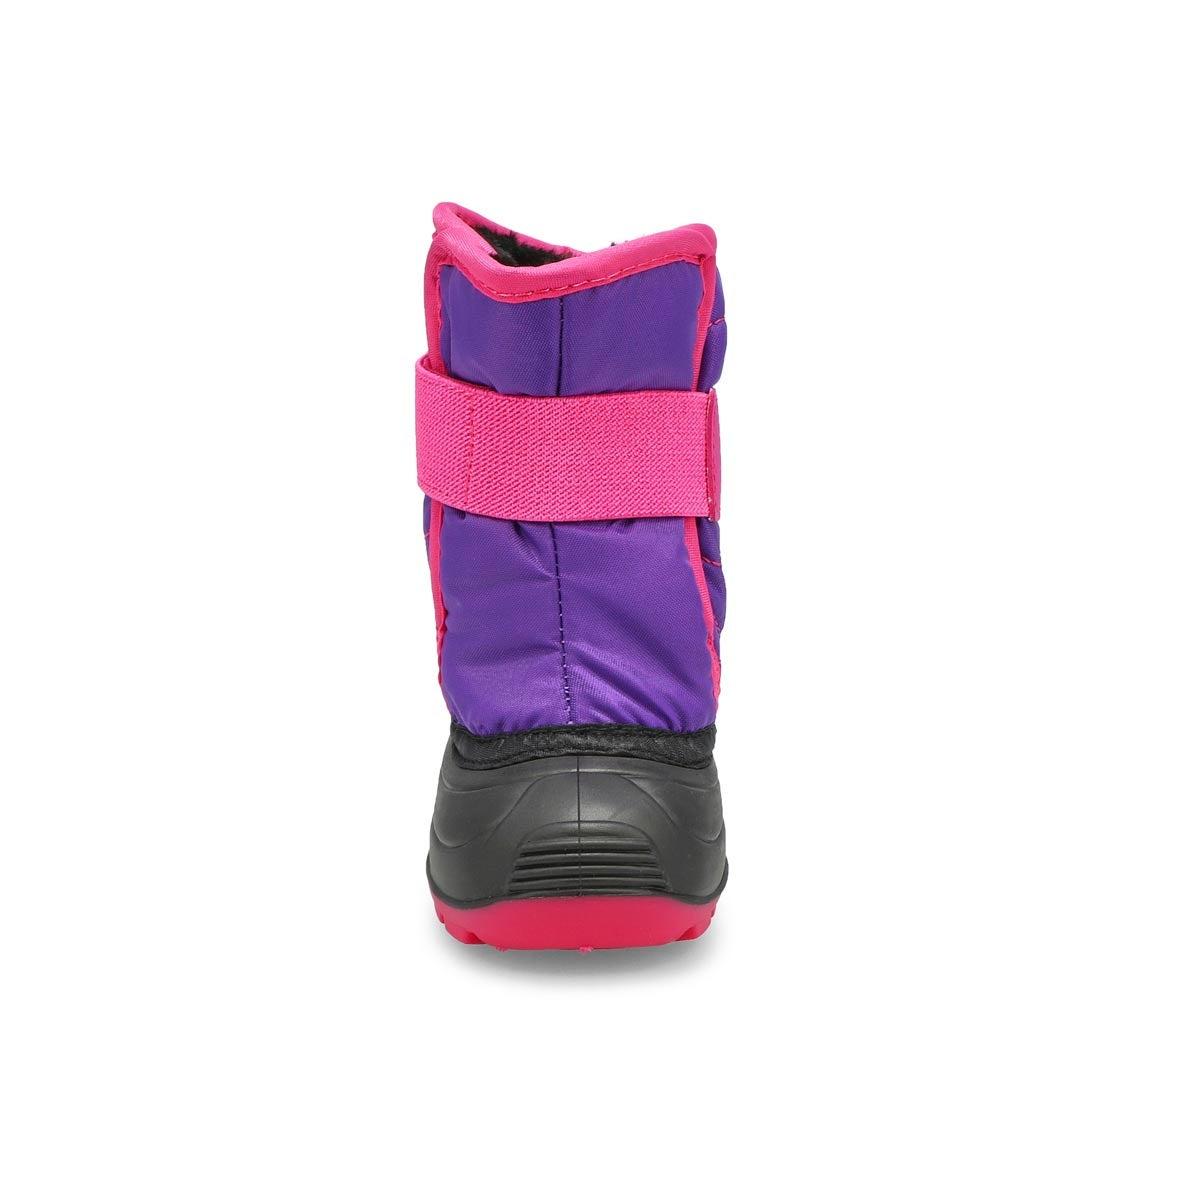 Toddlers' SNOWBUG 3  ppl/mgta wtpf winter boots